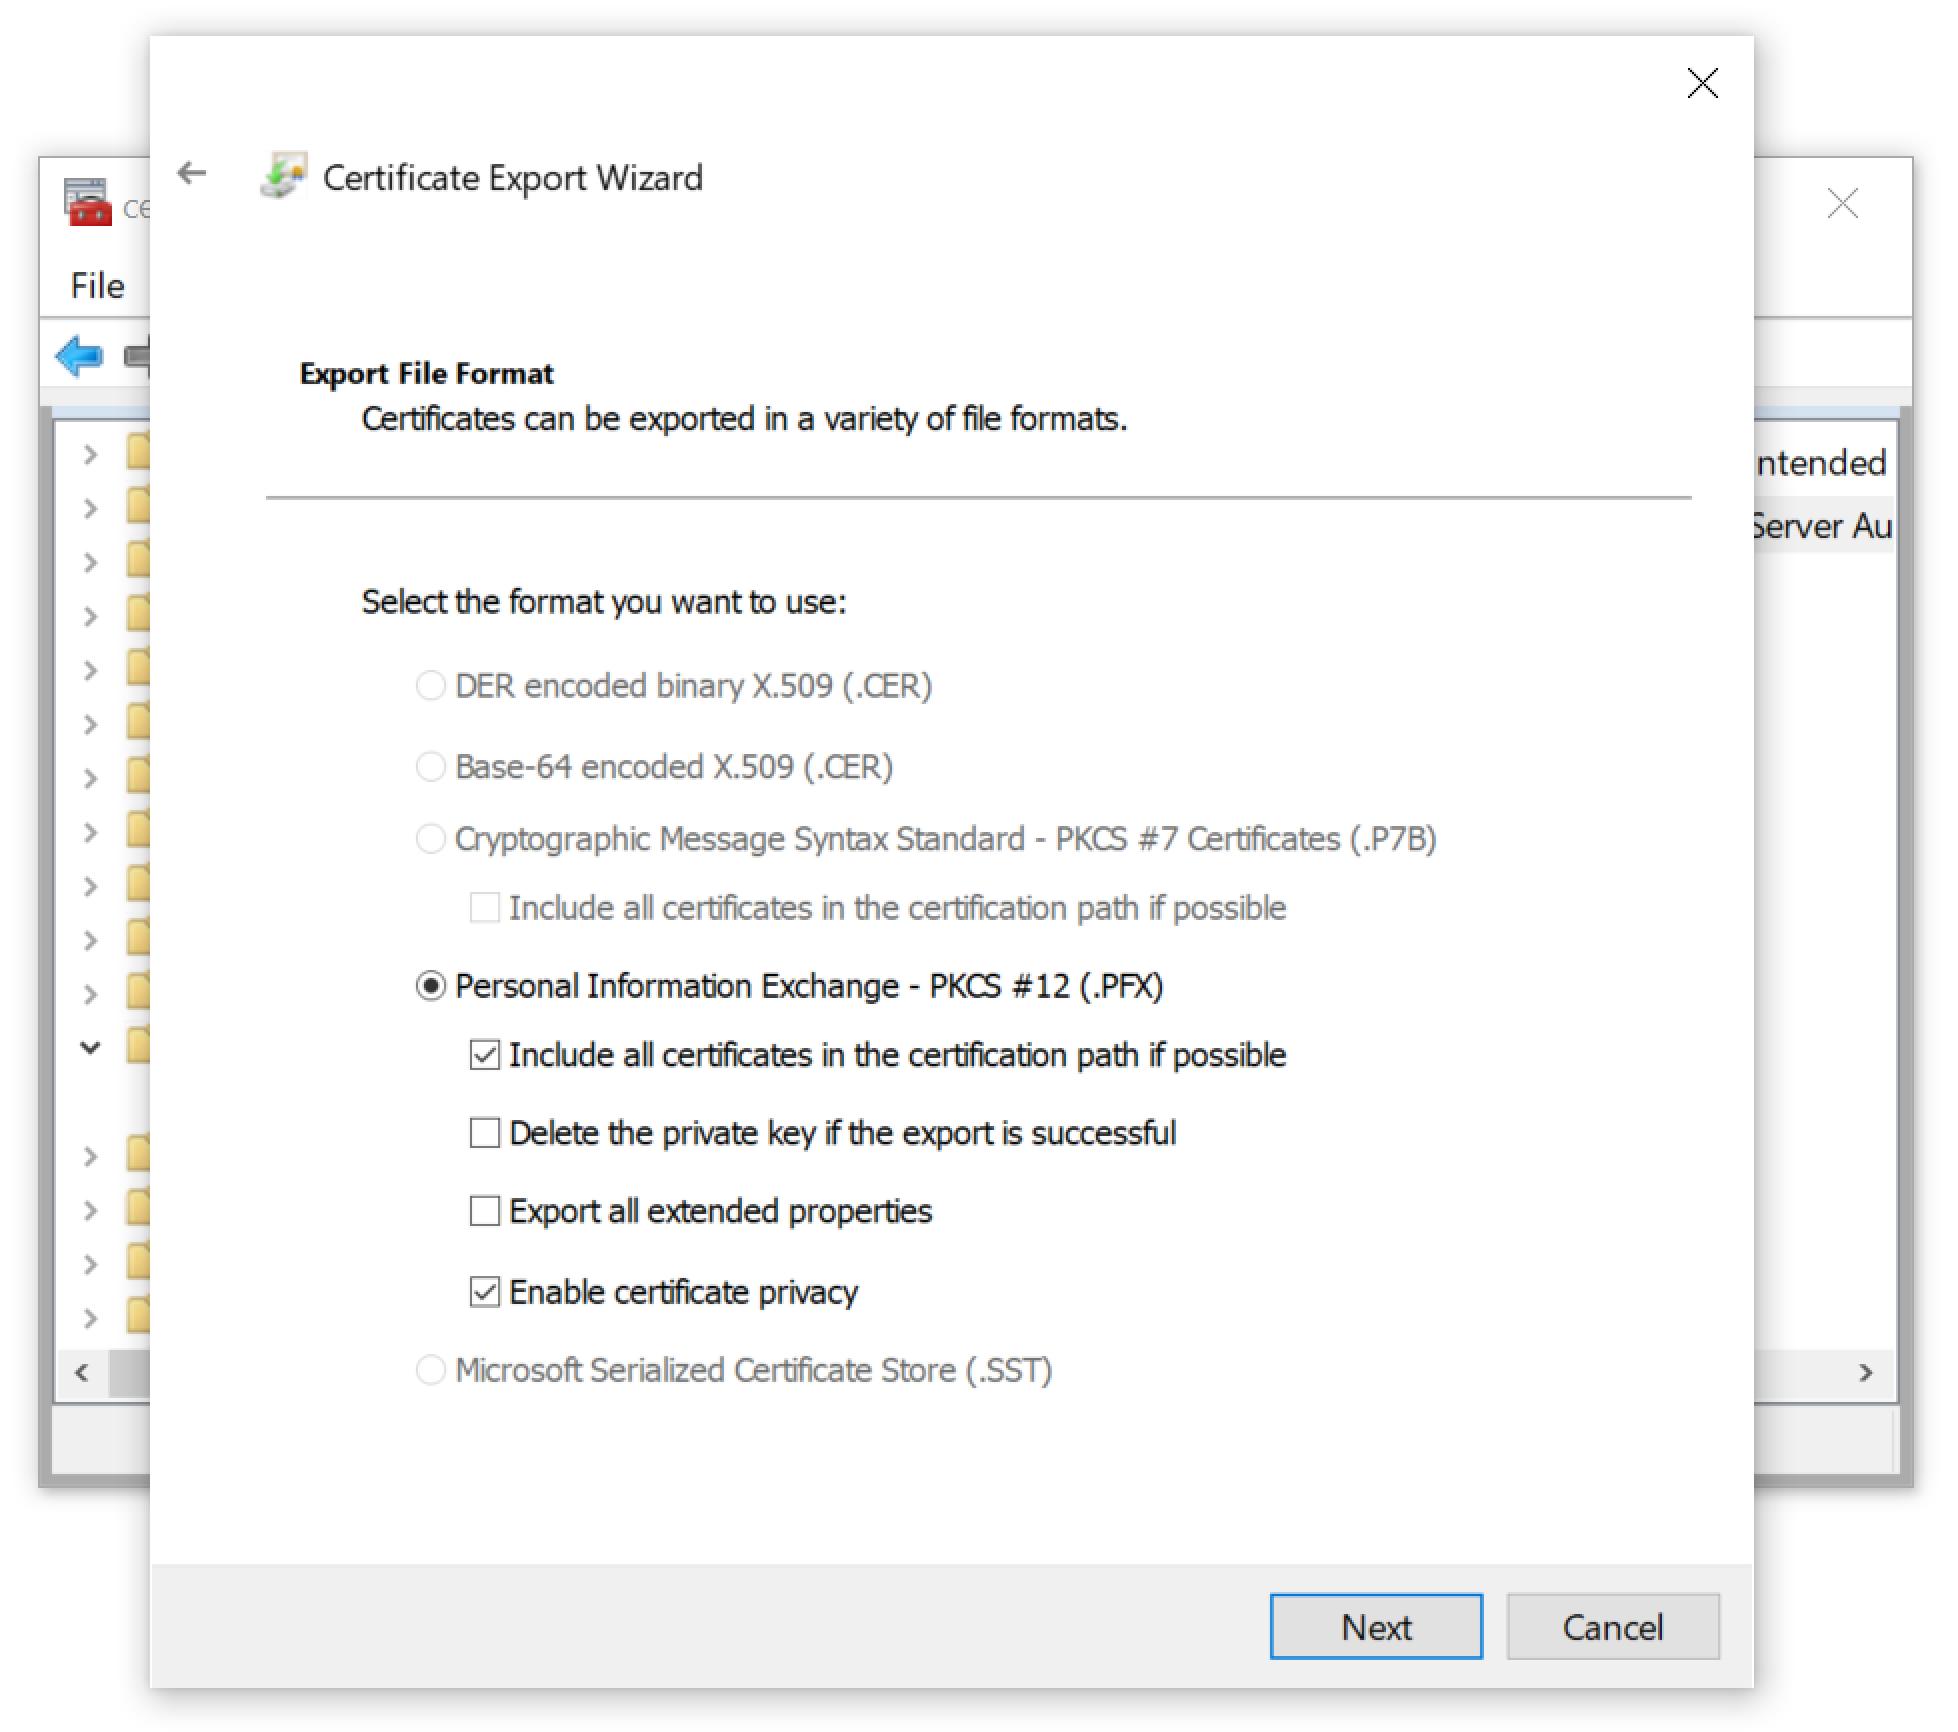 WiresharkでのRDPトラフィックの復号に関する本講座で使用されたホストの場合、ここに示されているように、証明書をPKCS#12(.PFX)ファイルとしてのみエクスポートできた